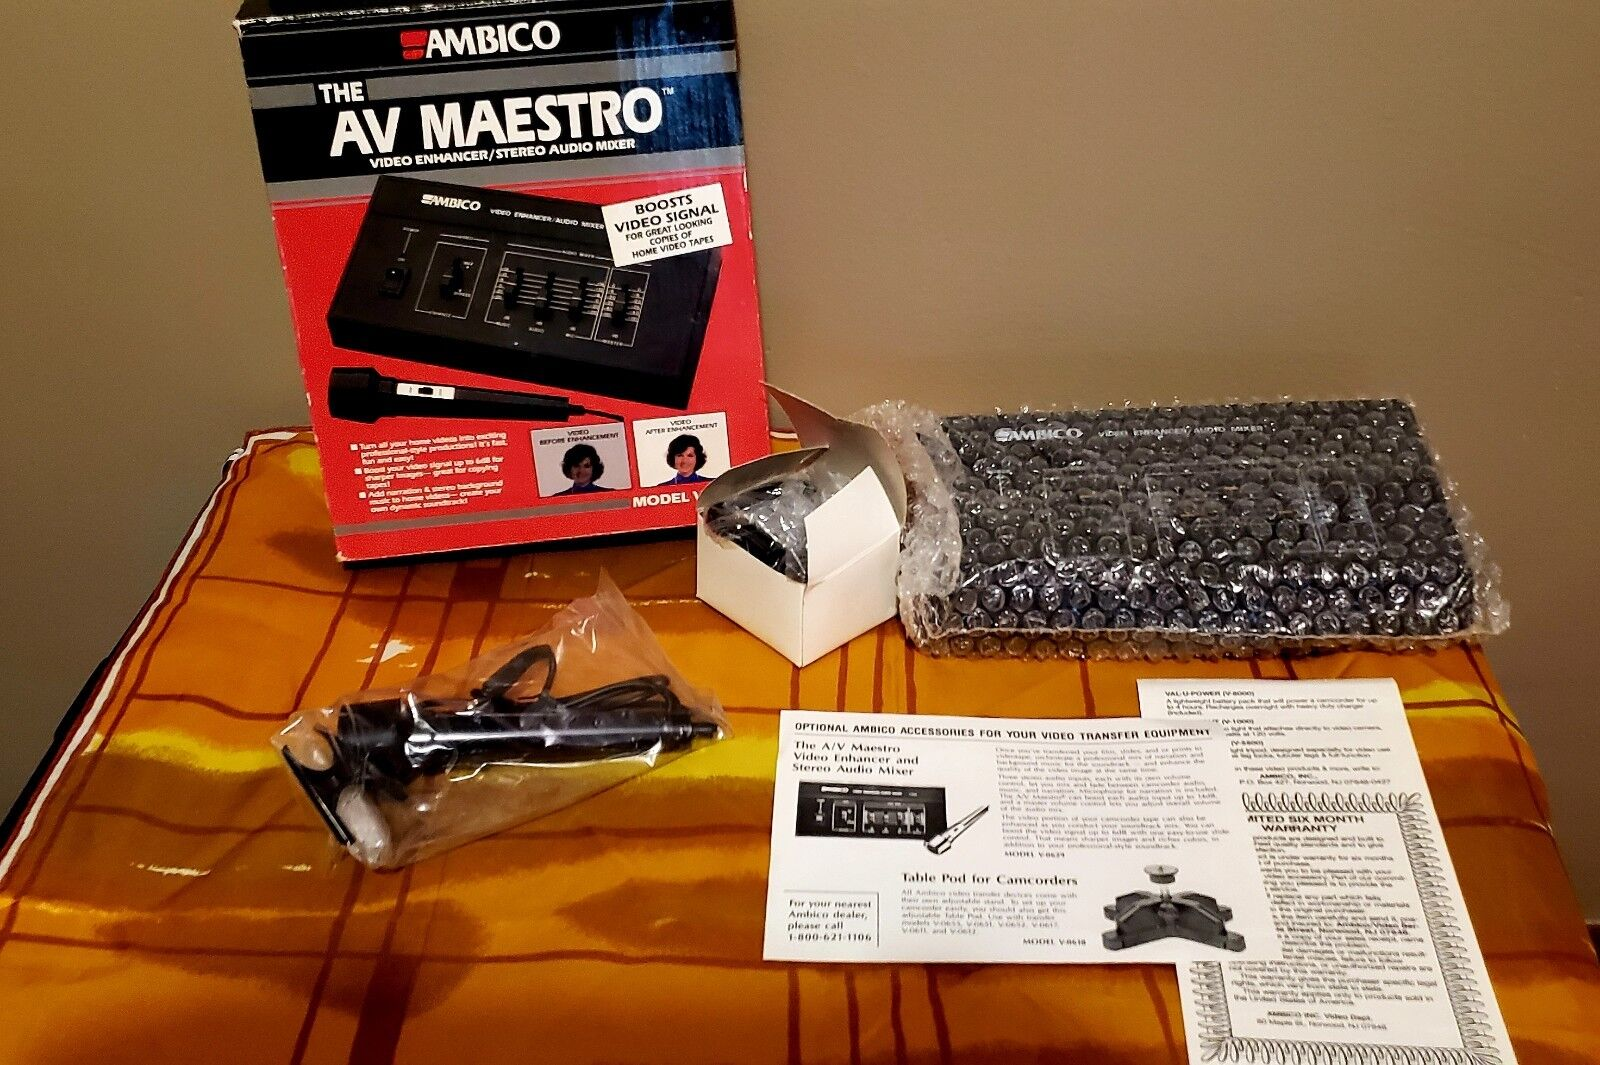 Ambico Av Maestro V0629 Video Enhancer Stereo Audio Mixer Reasonable Price Audio For Video